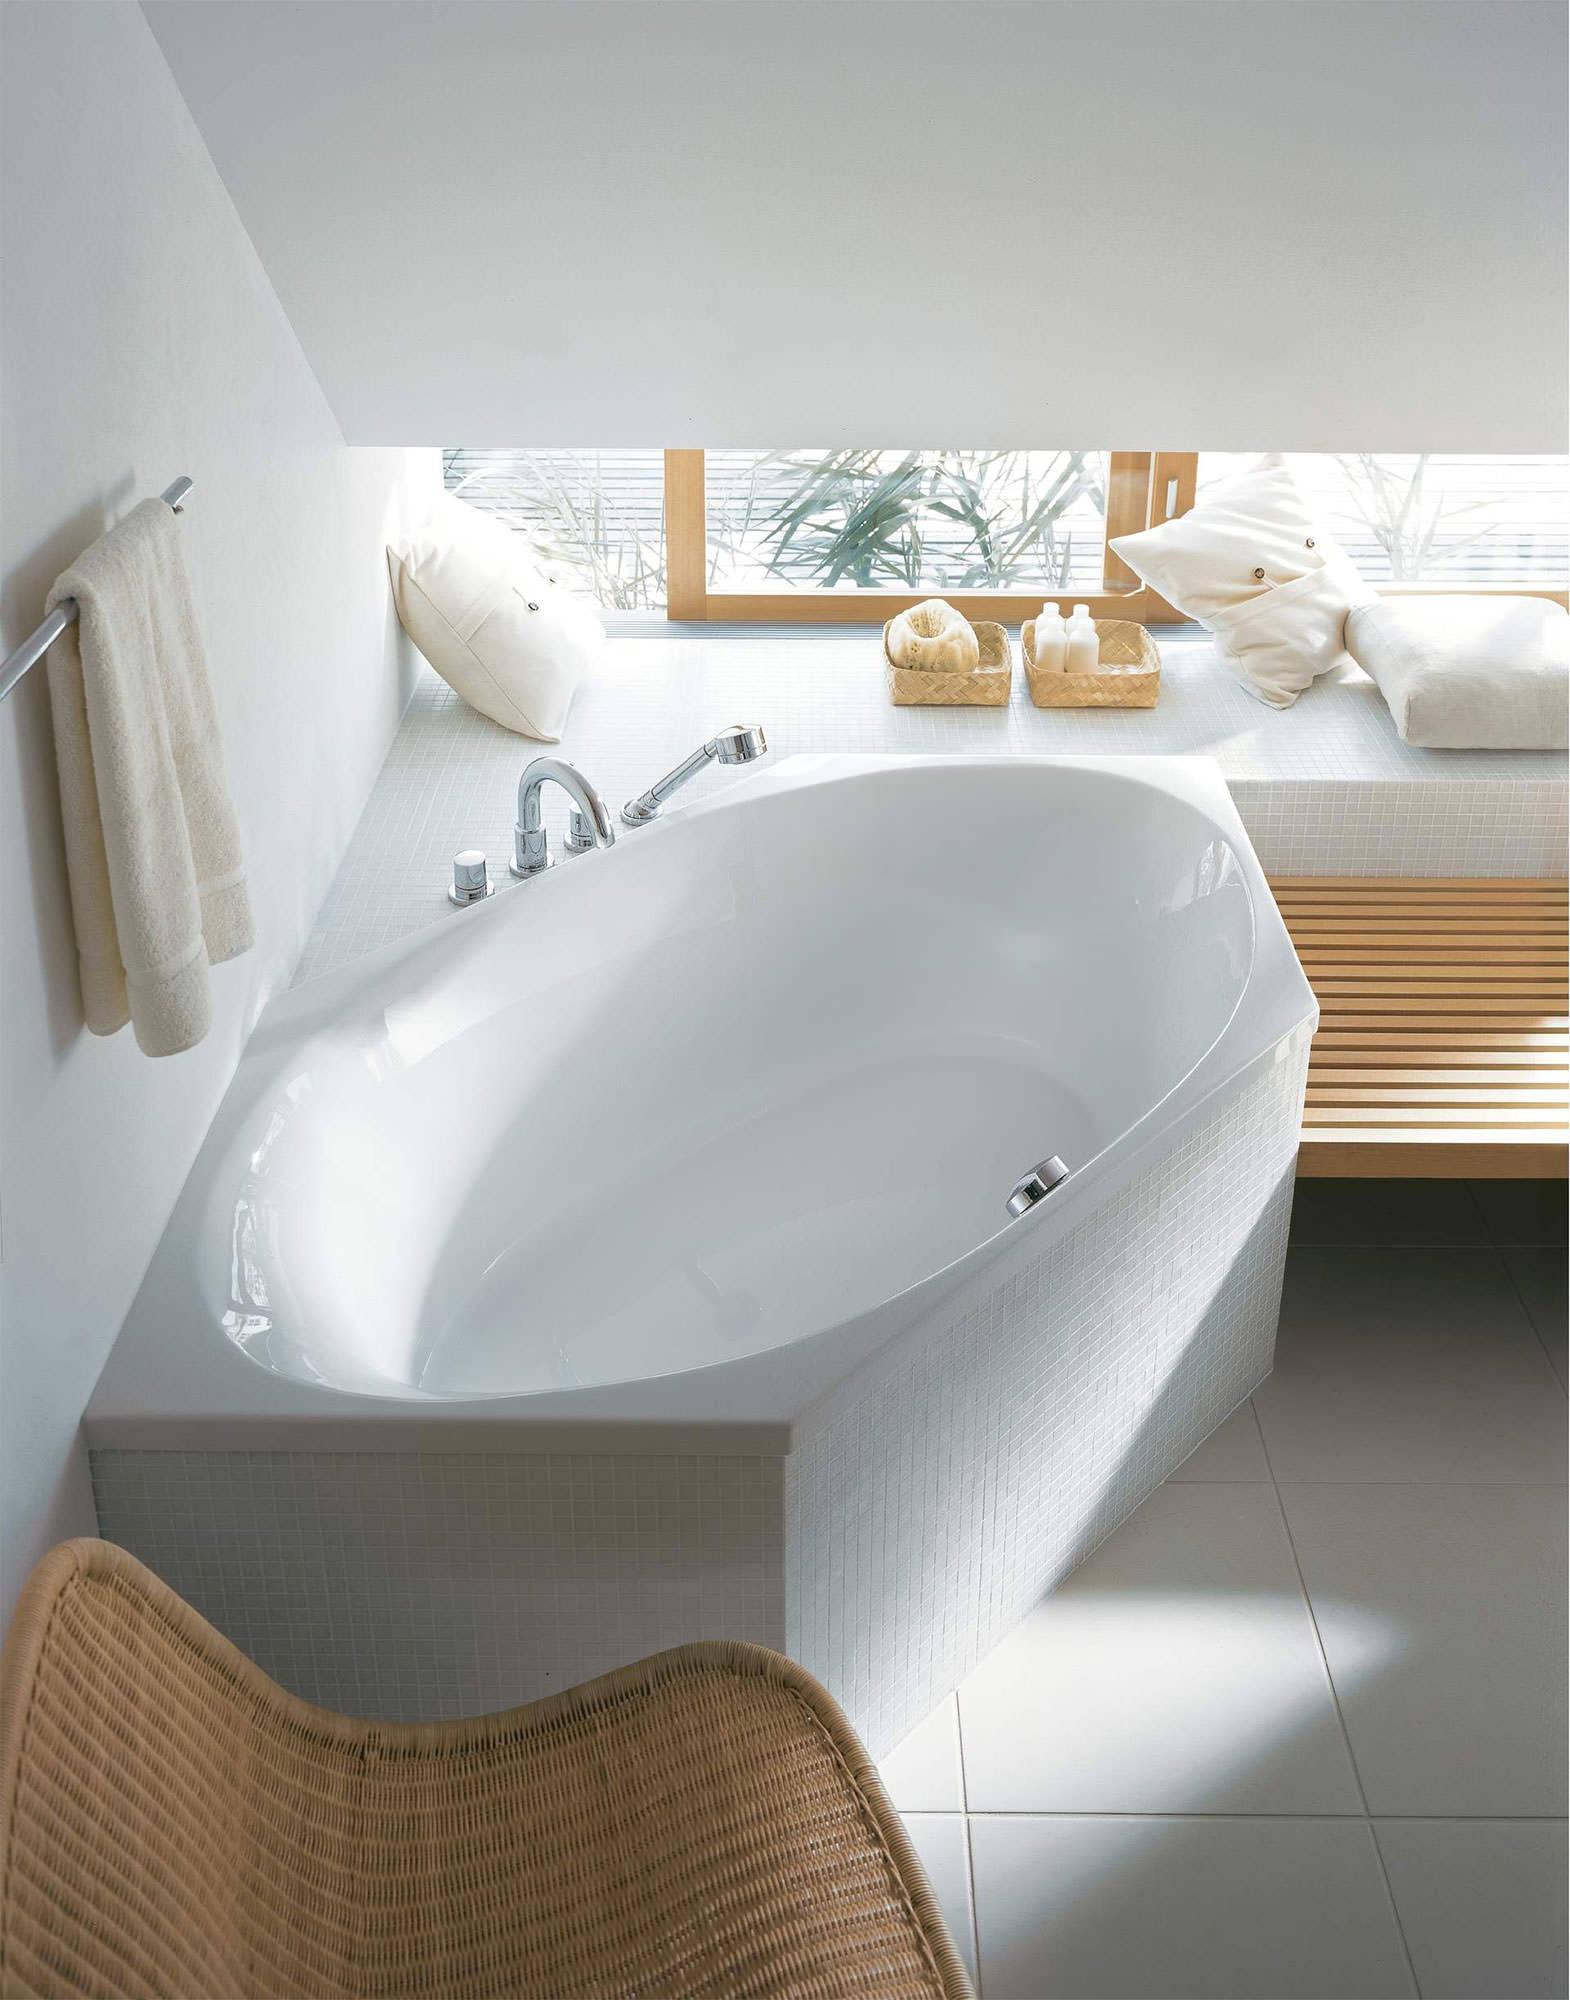 Duravit 2x3 Hexagonal 1900 x 900mm Bathtub With Frame - 700025